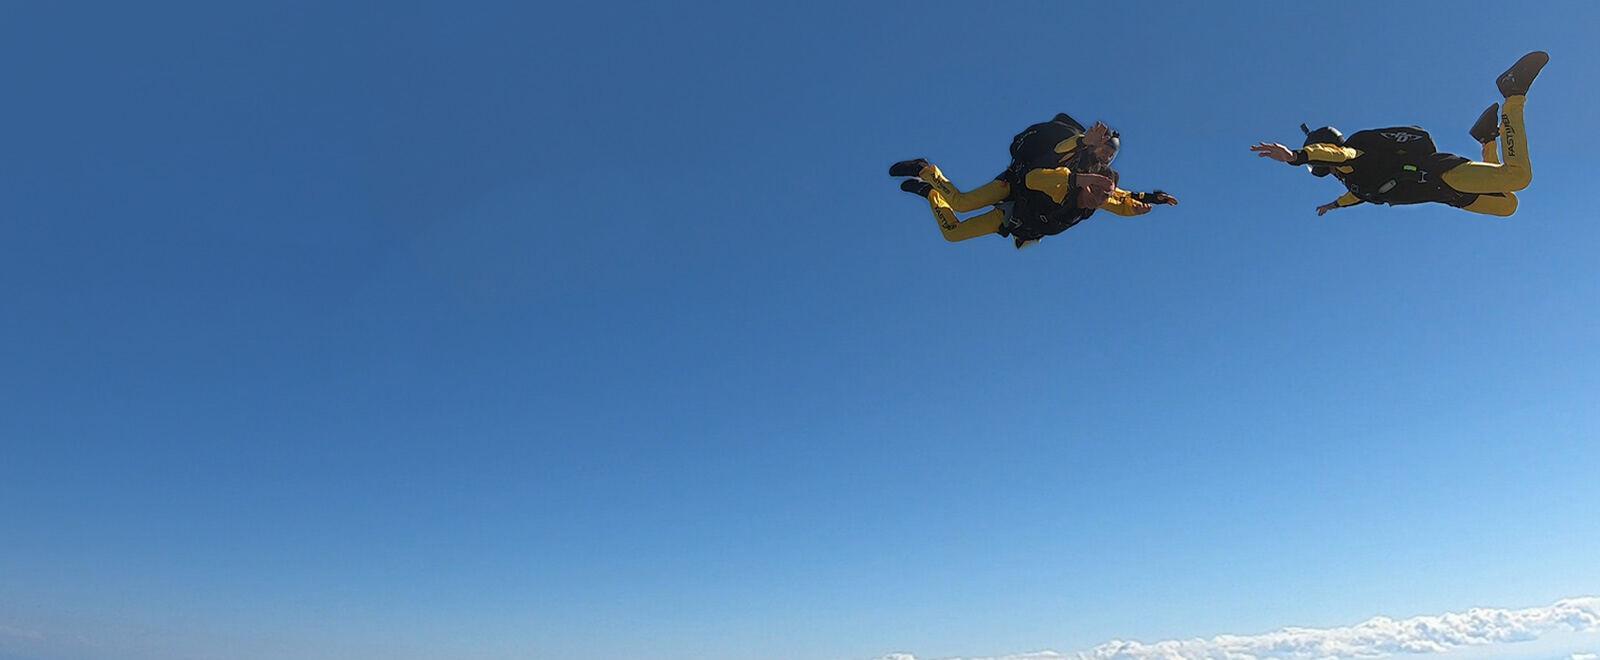 Giu' in 60 secondi - adrenalina ad alta quota